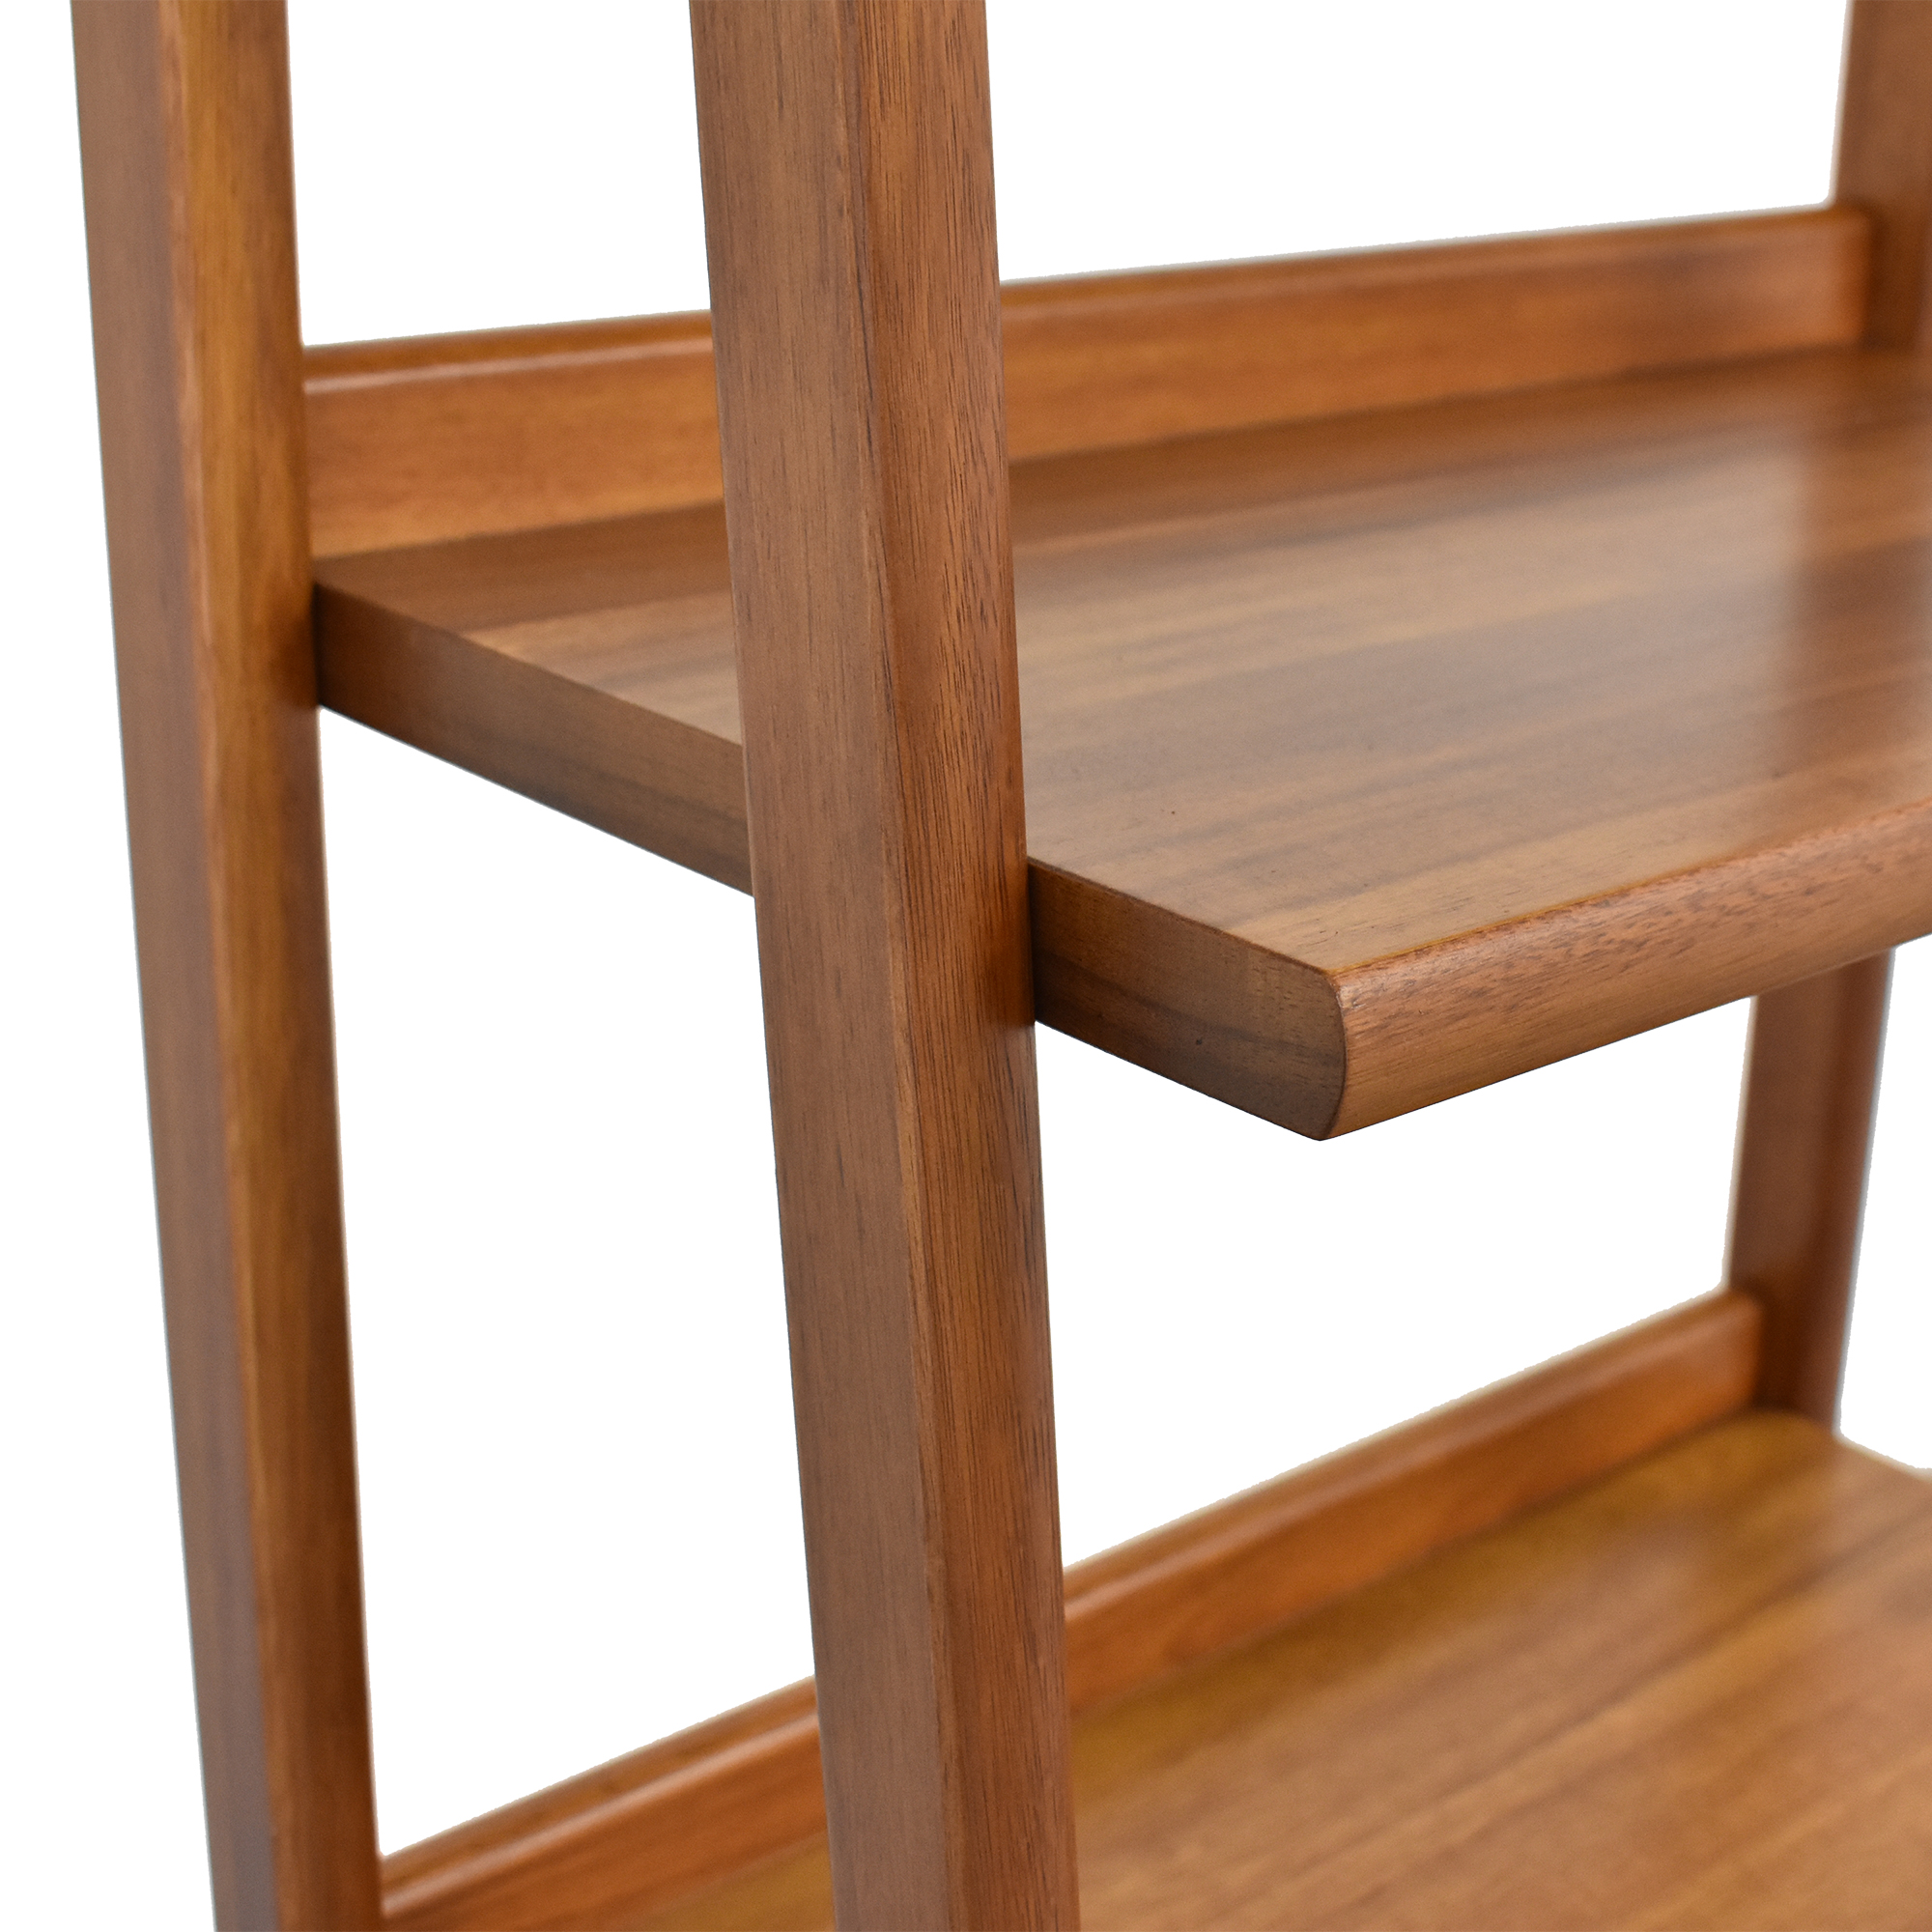 West Elm Mid-Century Bookshelf / Bookcases & Shelving